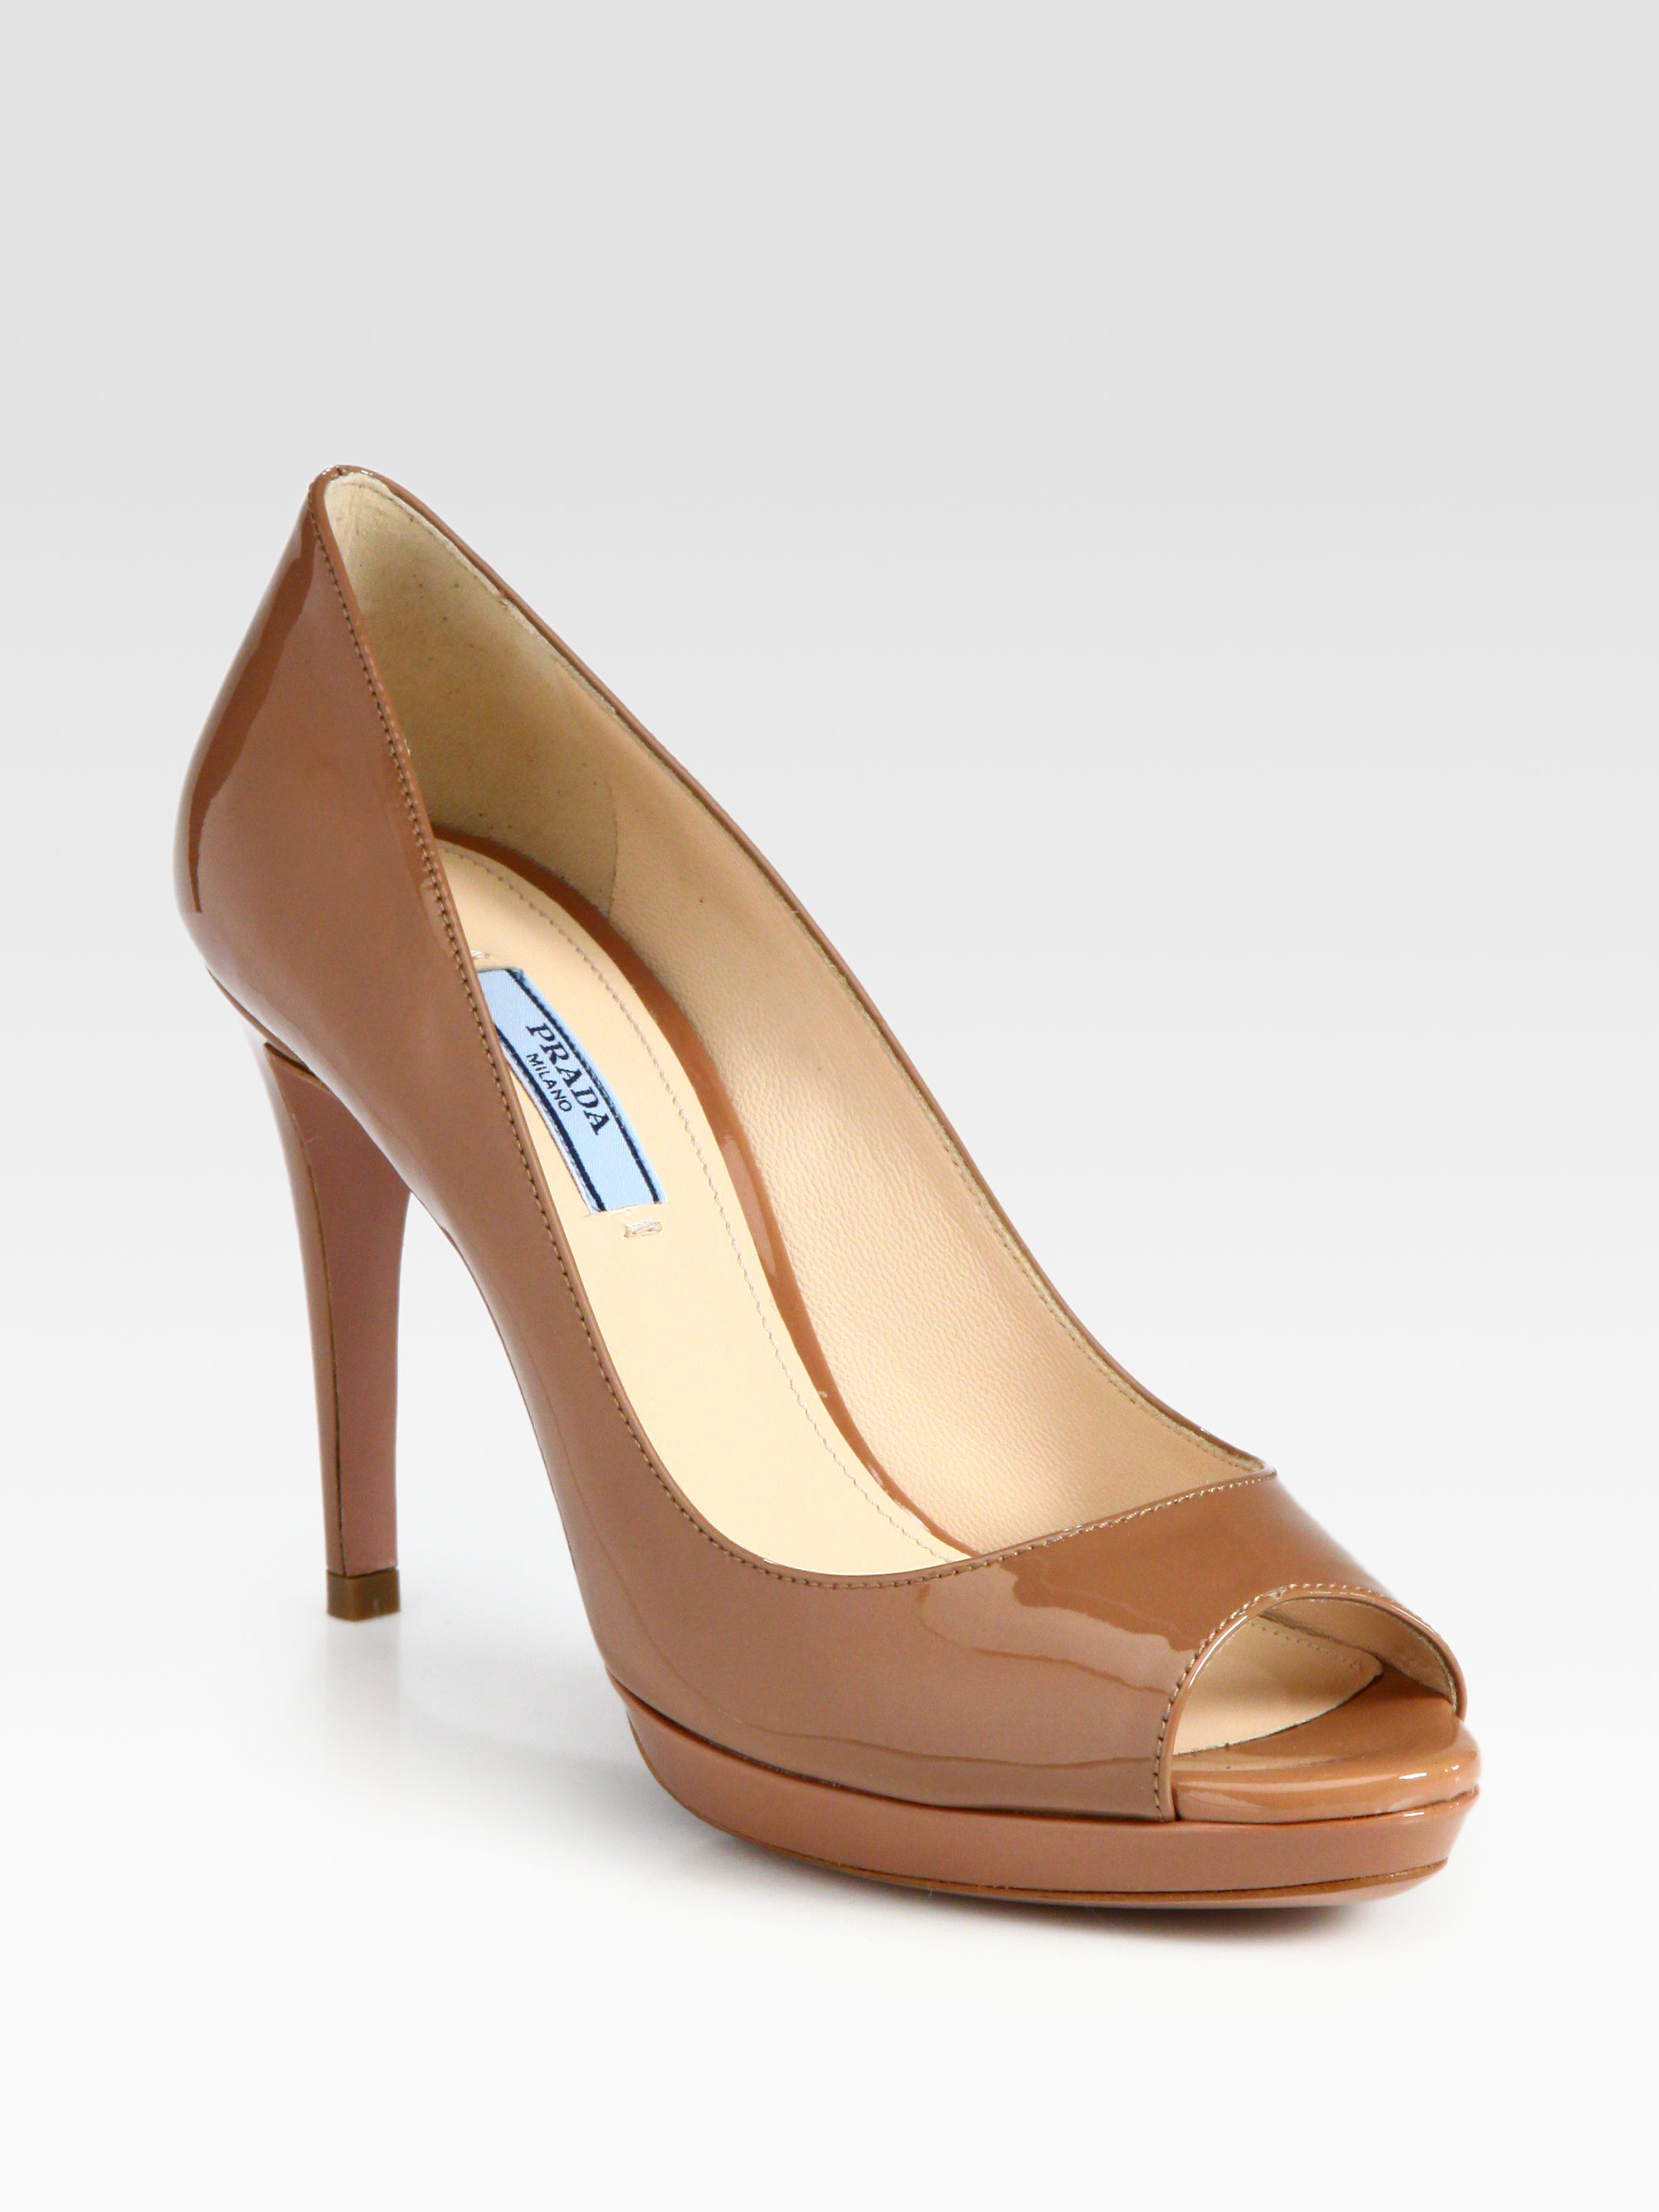 ee2fc6f4f35 Lyst - Prada Patent Leather Peep Toe Pumps in Brown